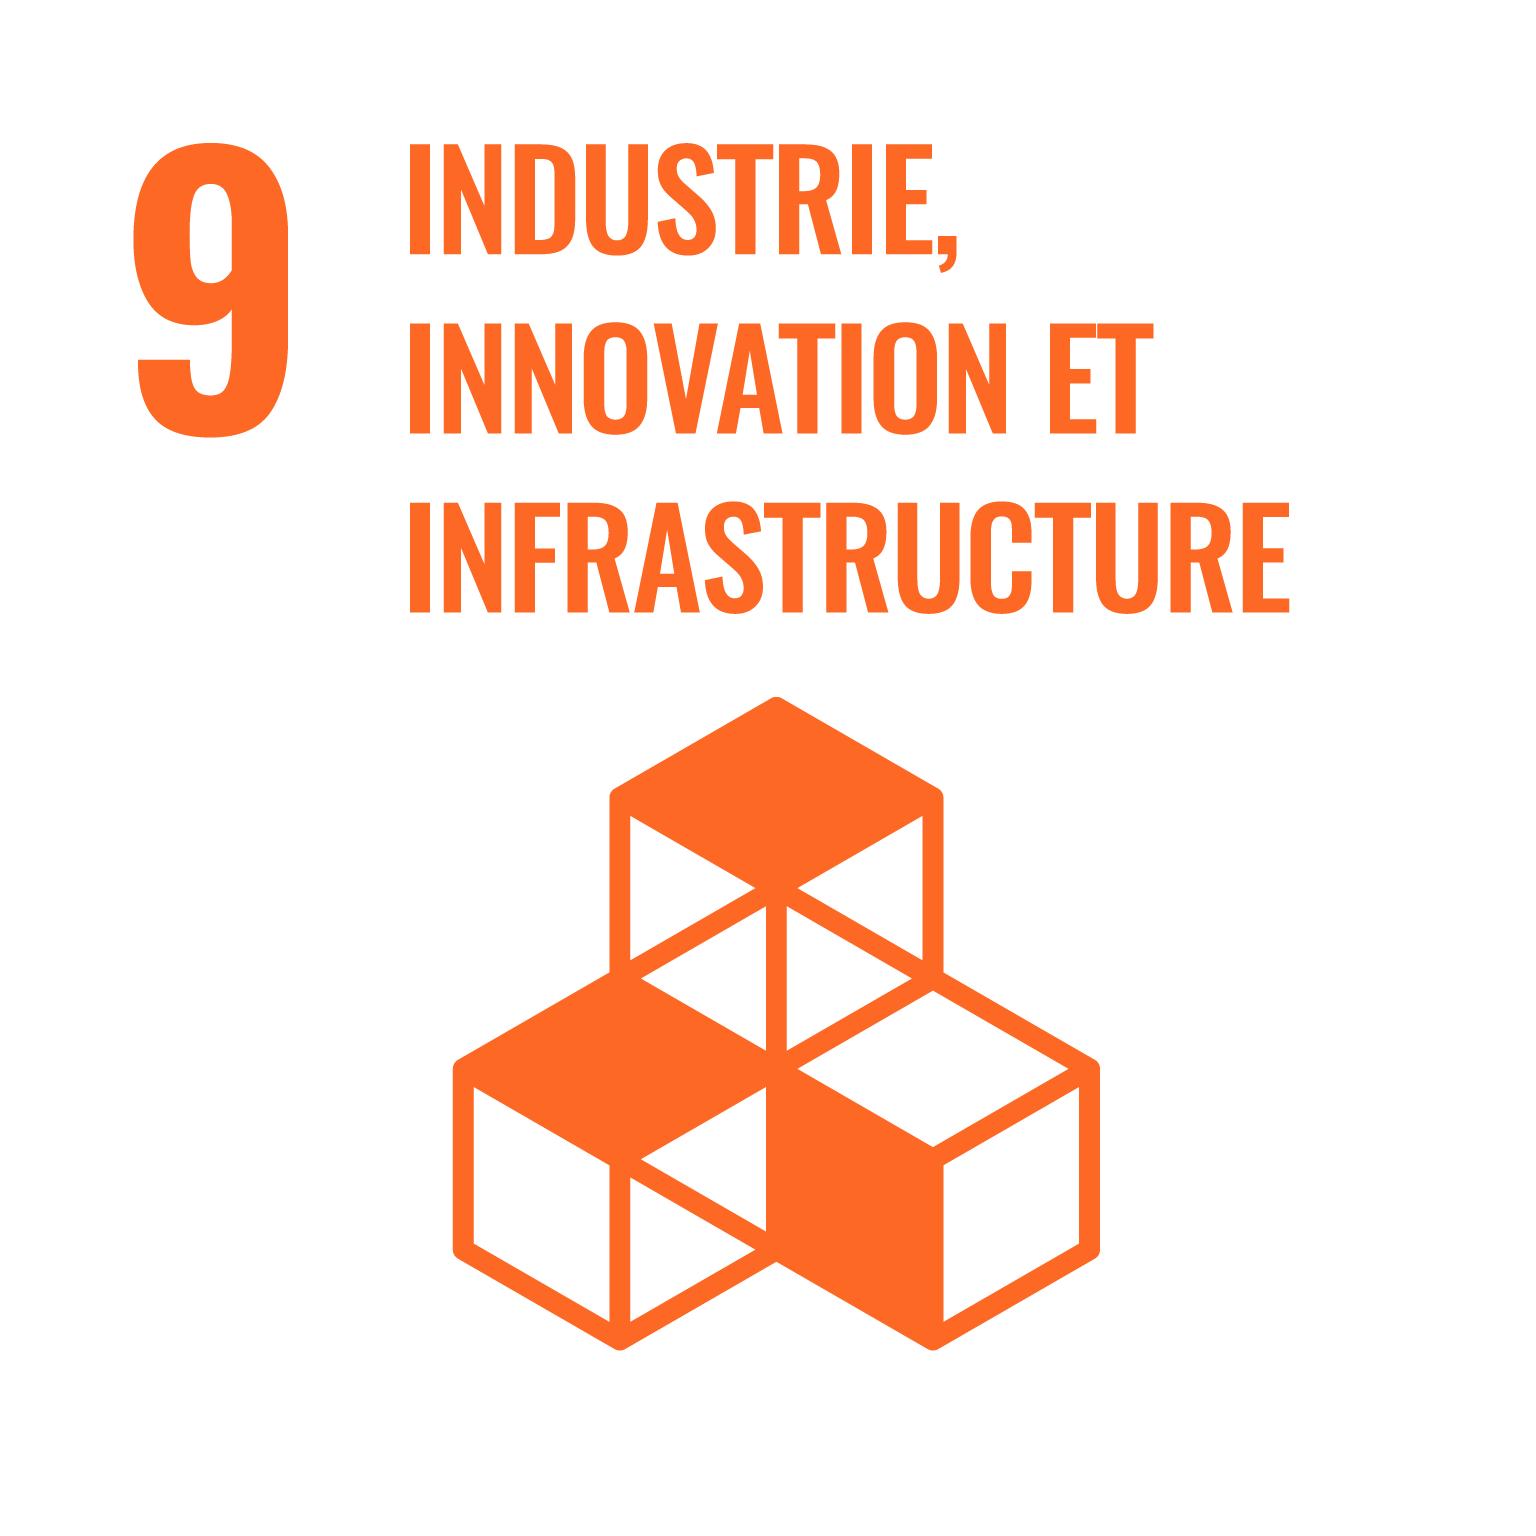 industrie, innovation et infrastructure.